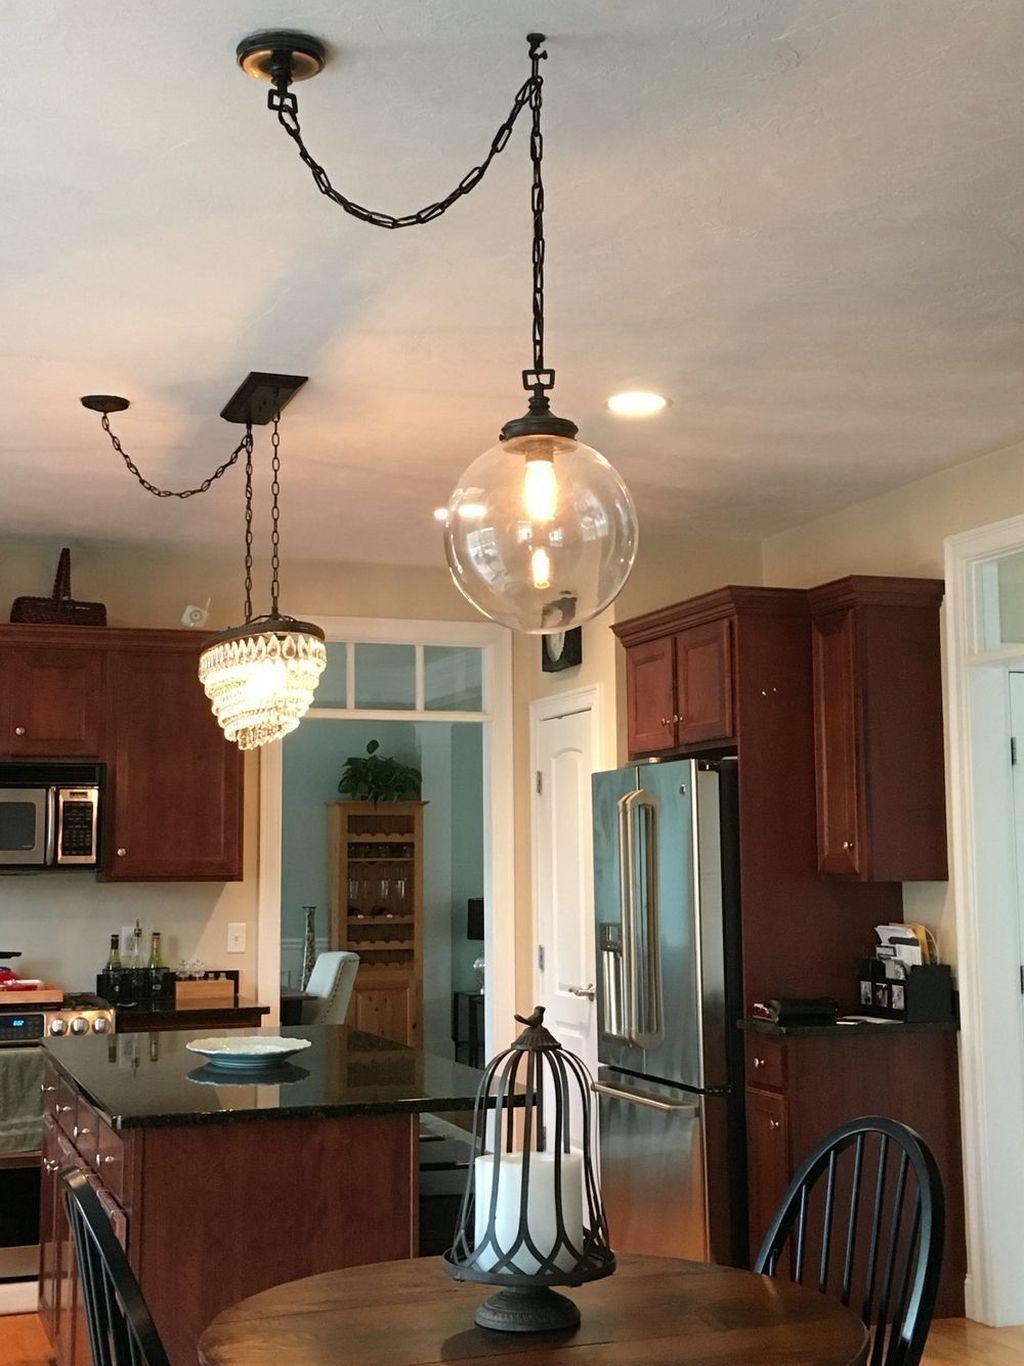 38 Stunning Lighting Design Ideas For Dining Room Dining Room Light Fixtures Dining Room Lighting Dining Lighting